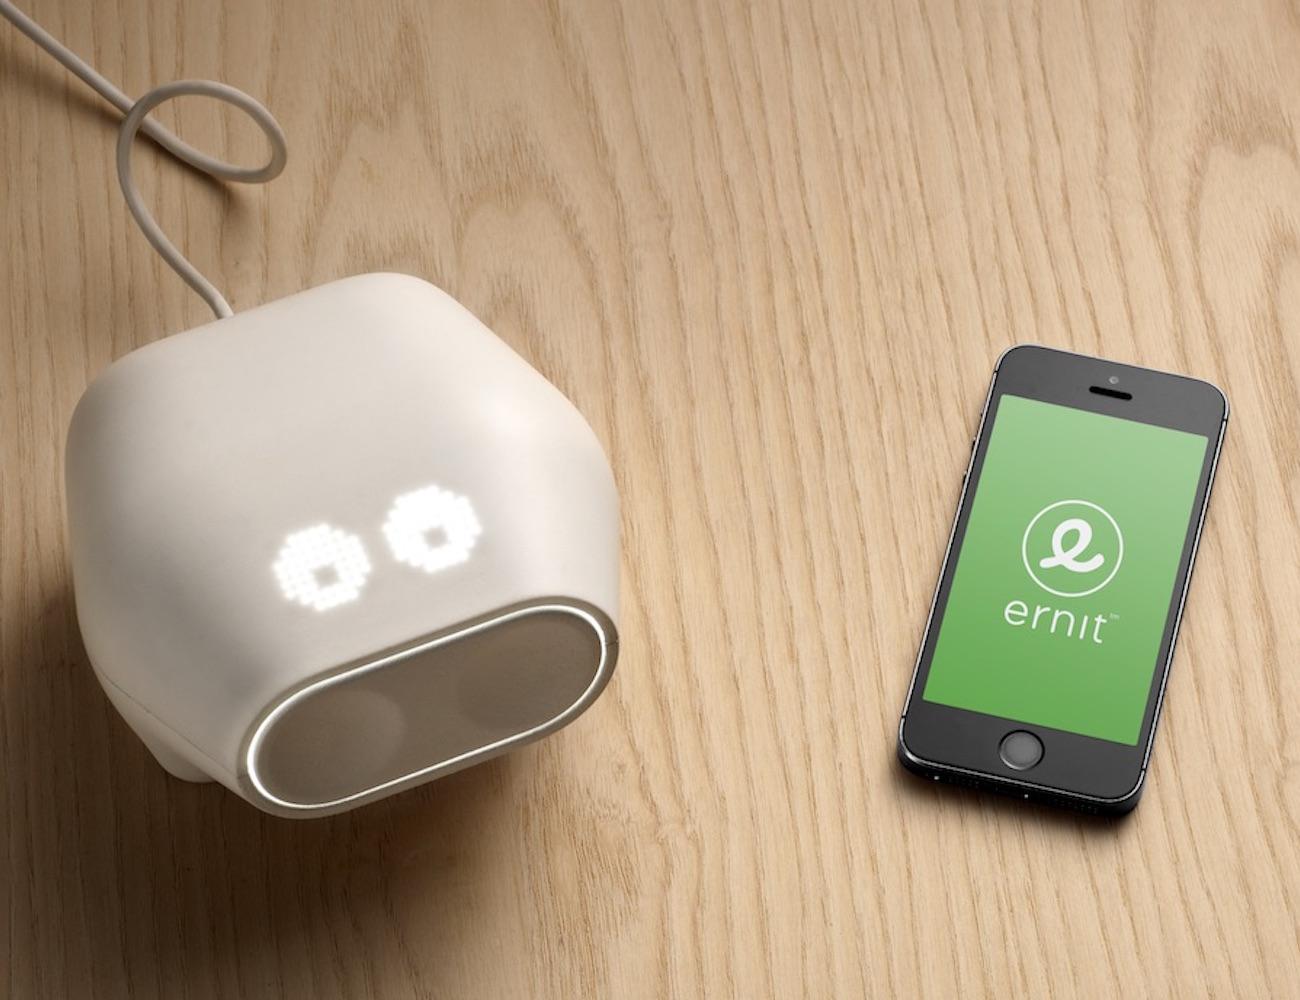 ERNIT – The Intelligent Digital Piggy Bank